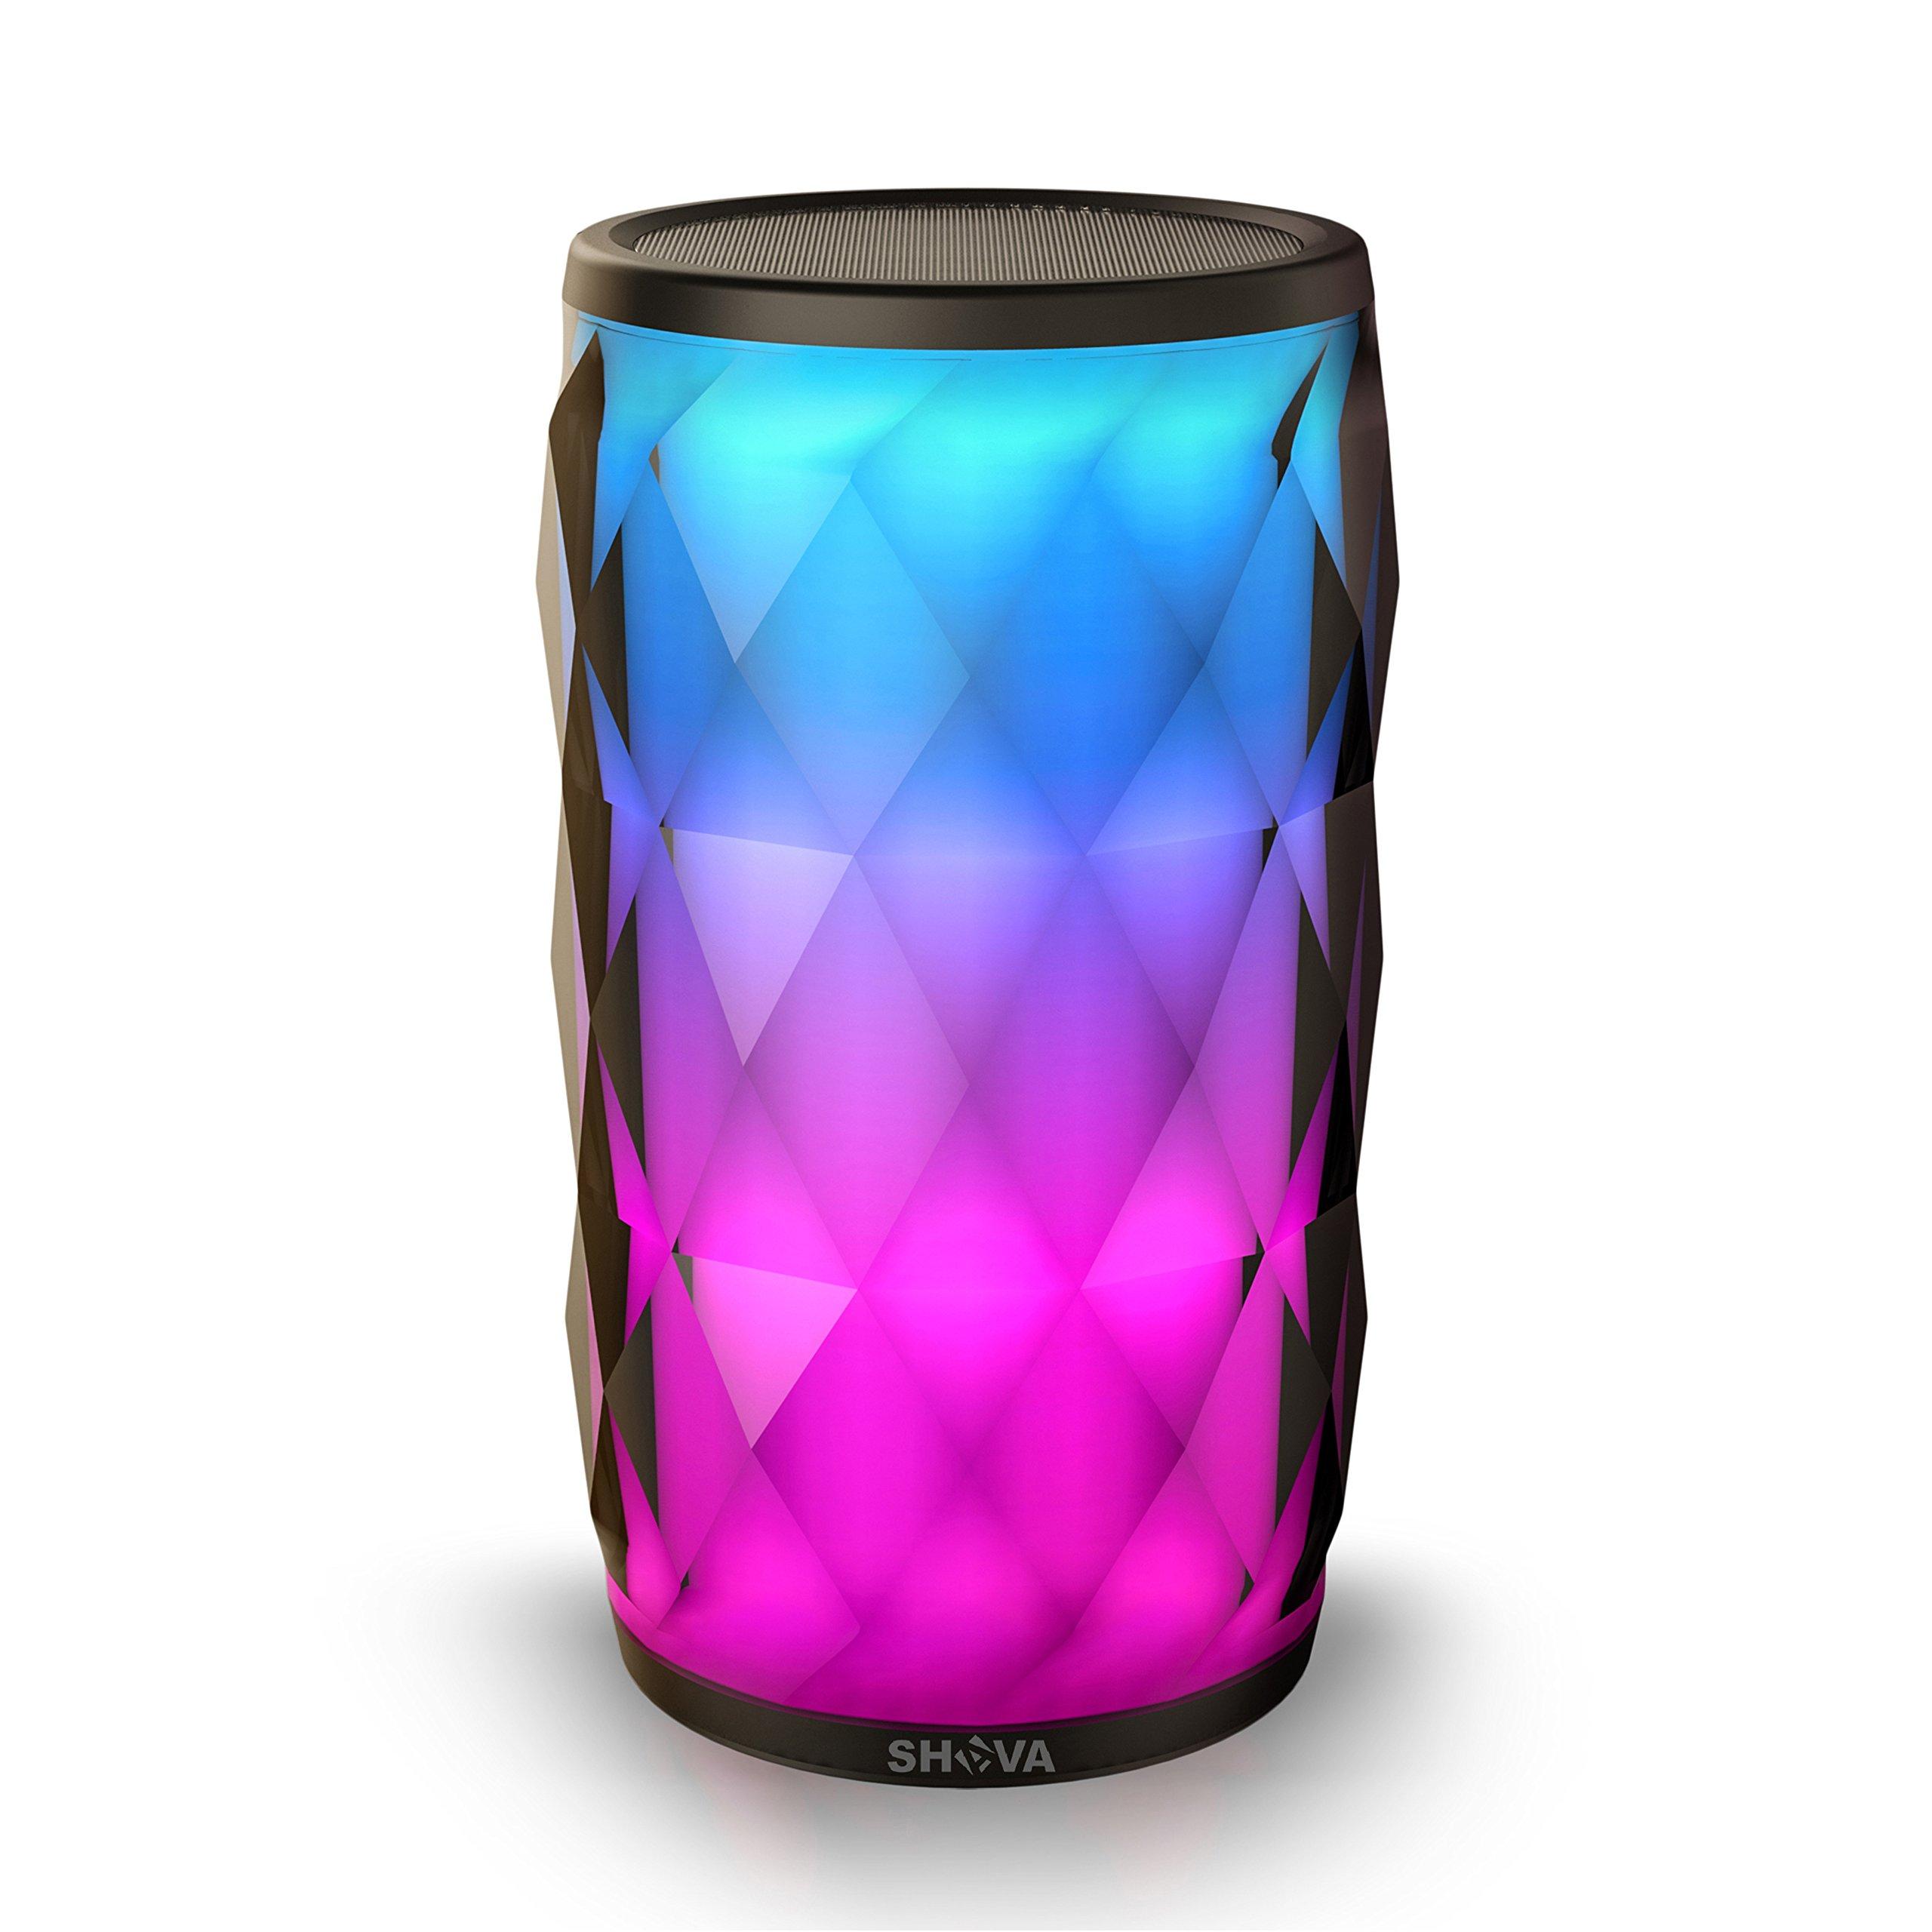 Night Light Bluetooth Speaker Shava Jewel Portable